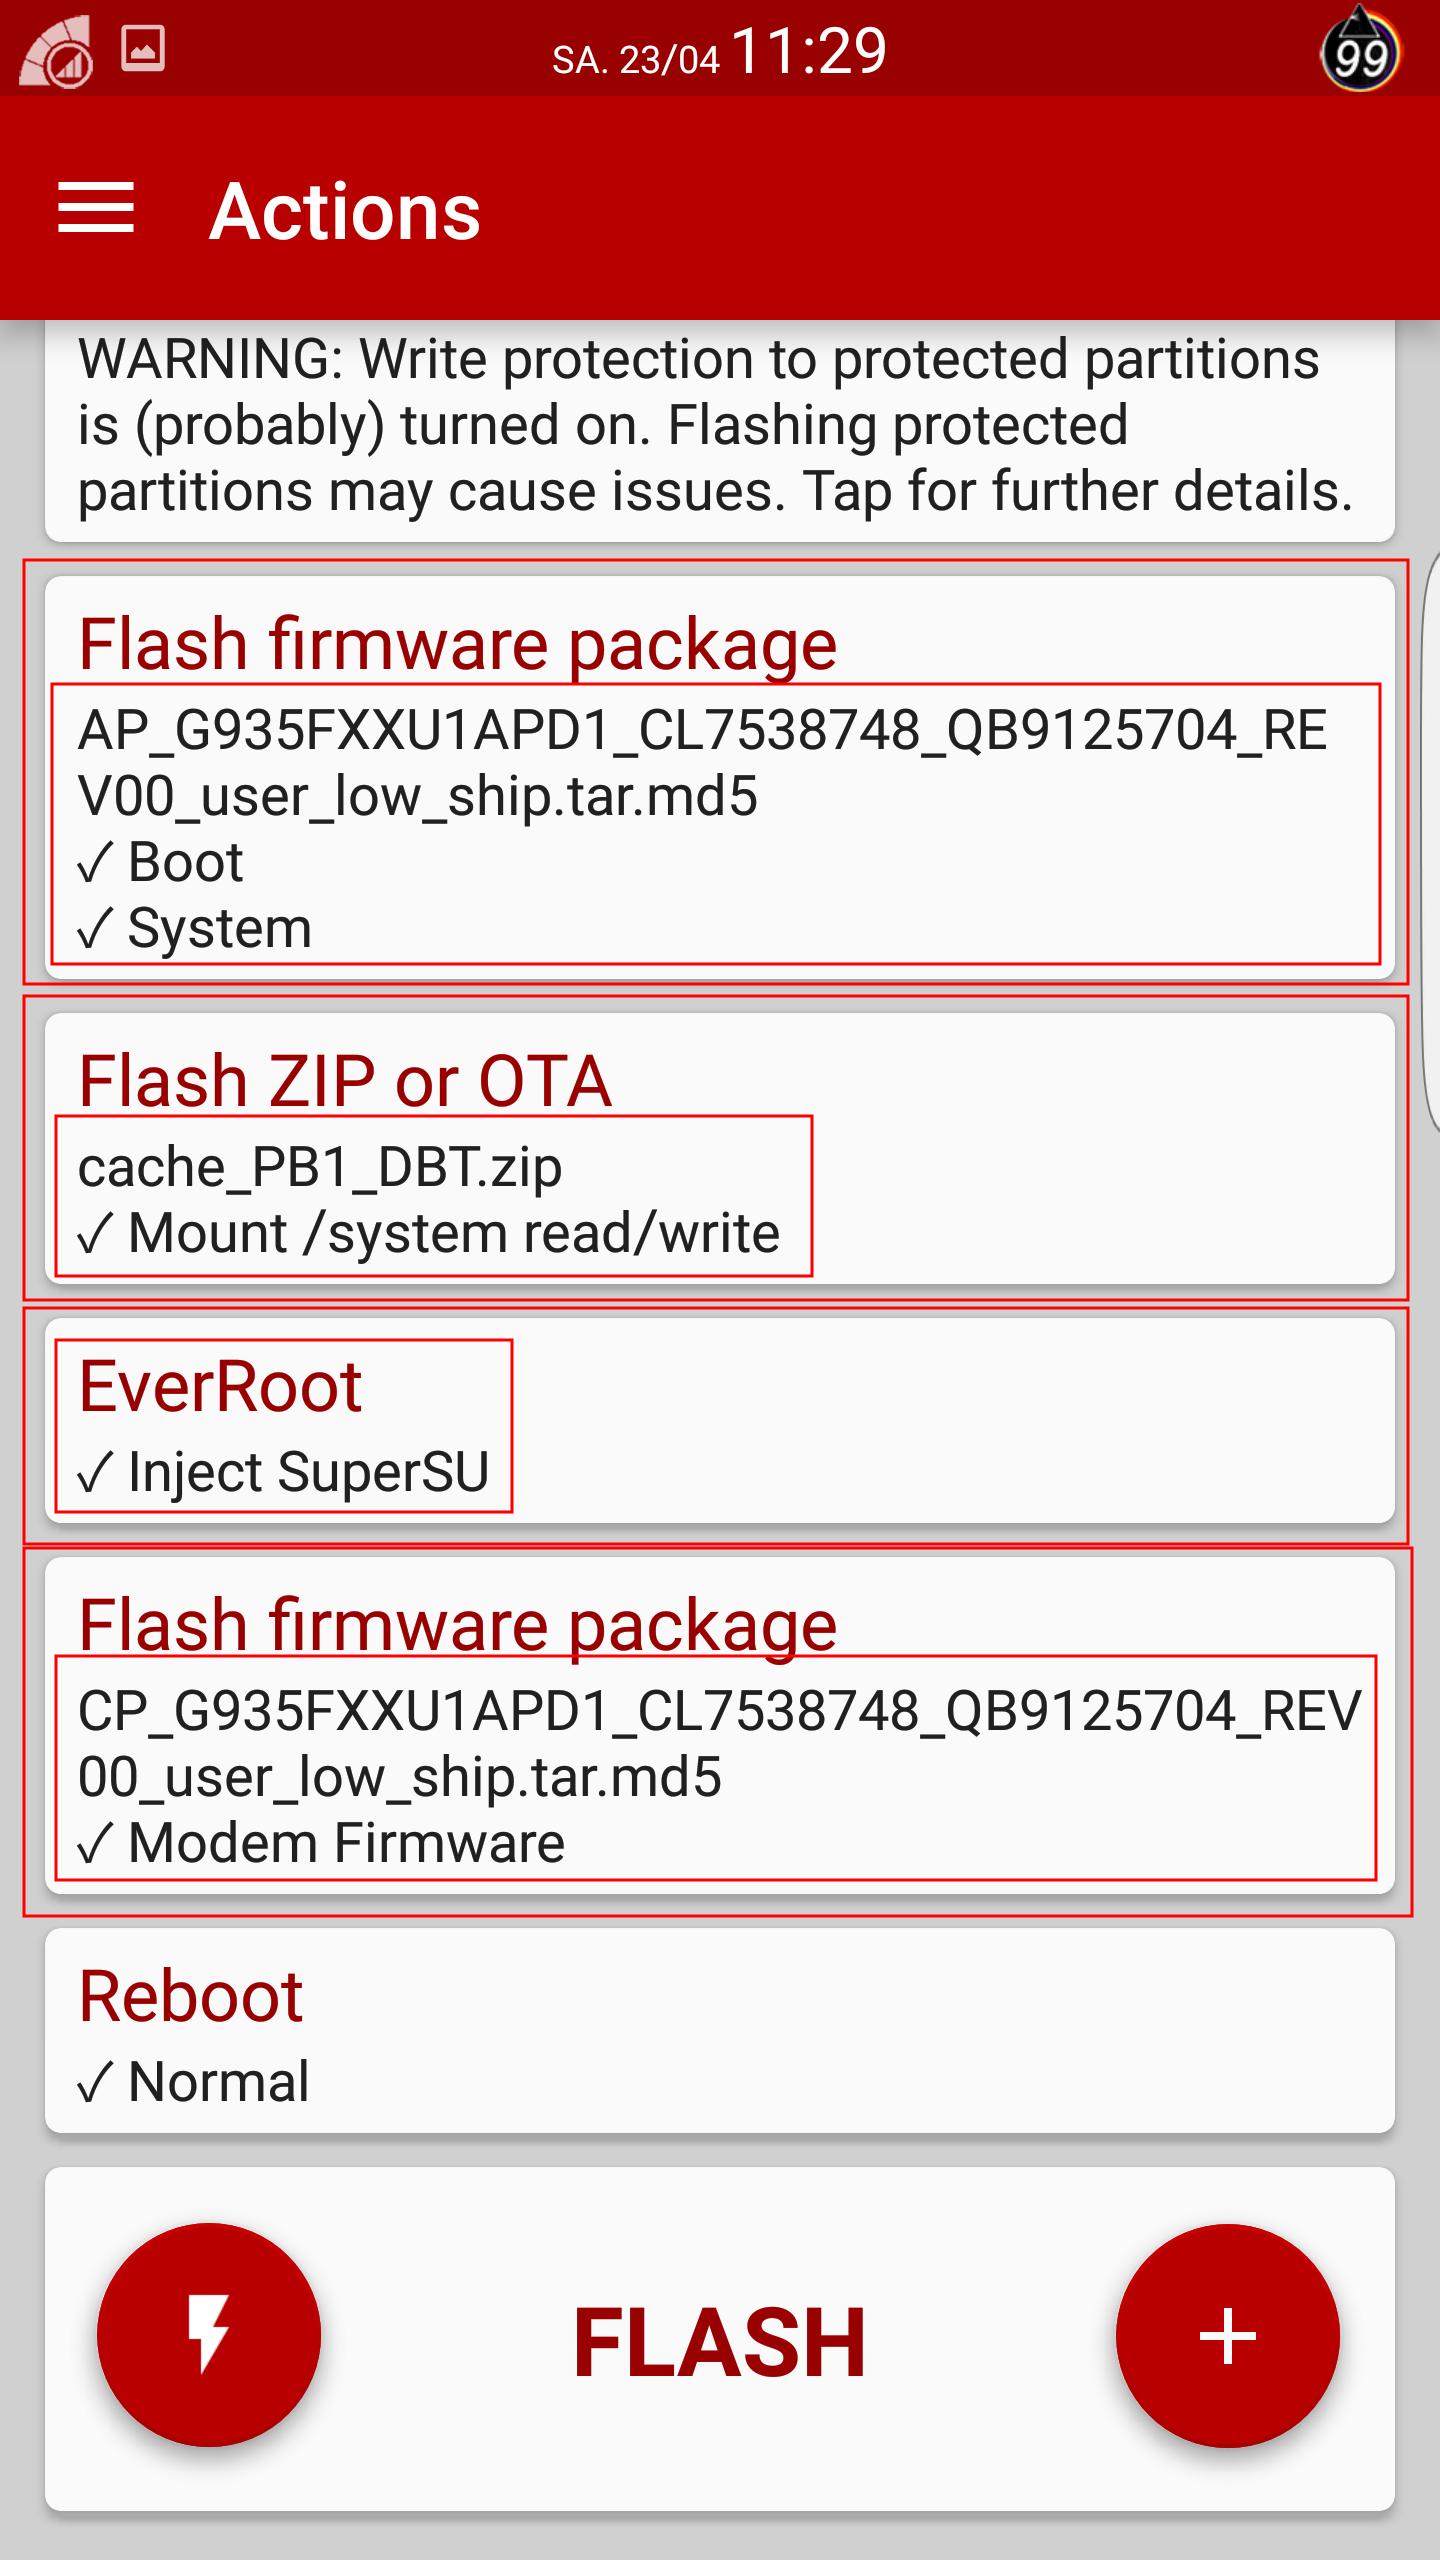 [Anleitung] Firmware Update ohne Datenverlust mit Root - Galaxy S7/ Edge [FlashFire]-screenshot_20160423-112906.png